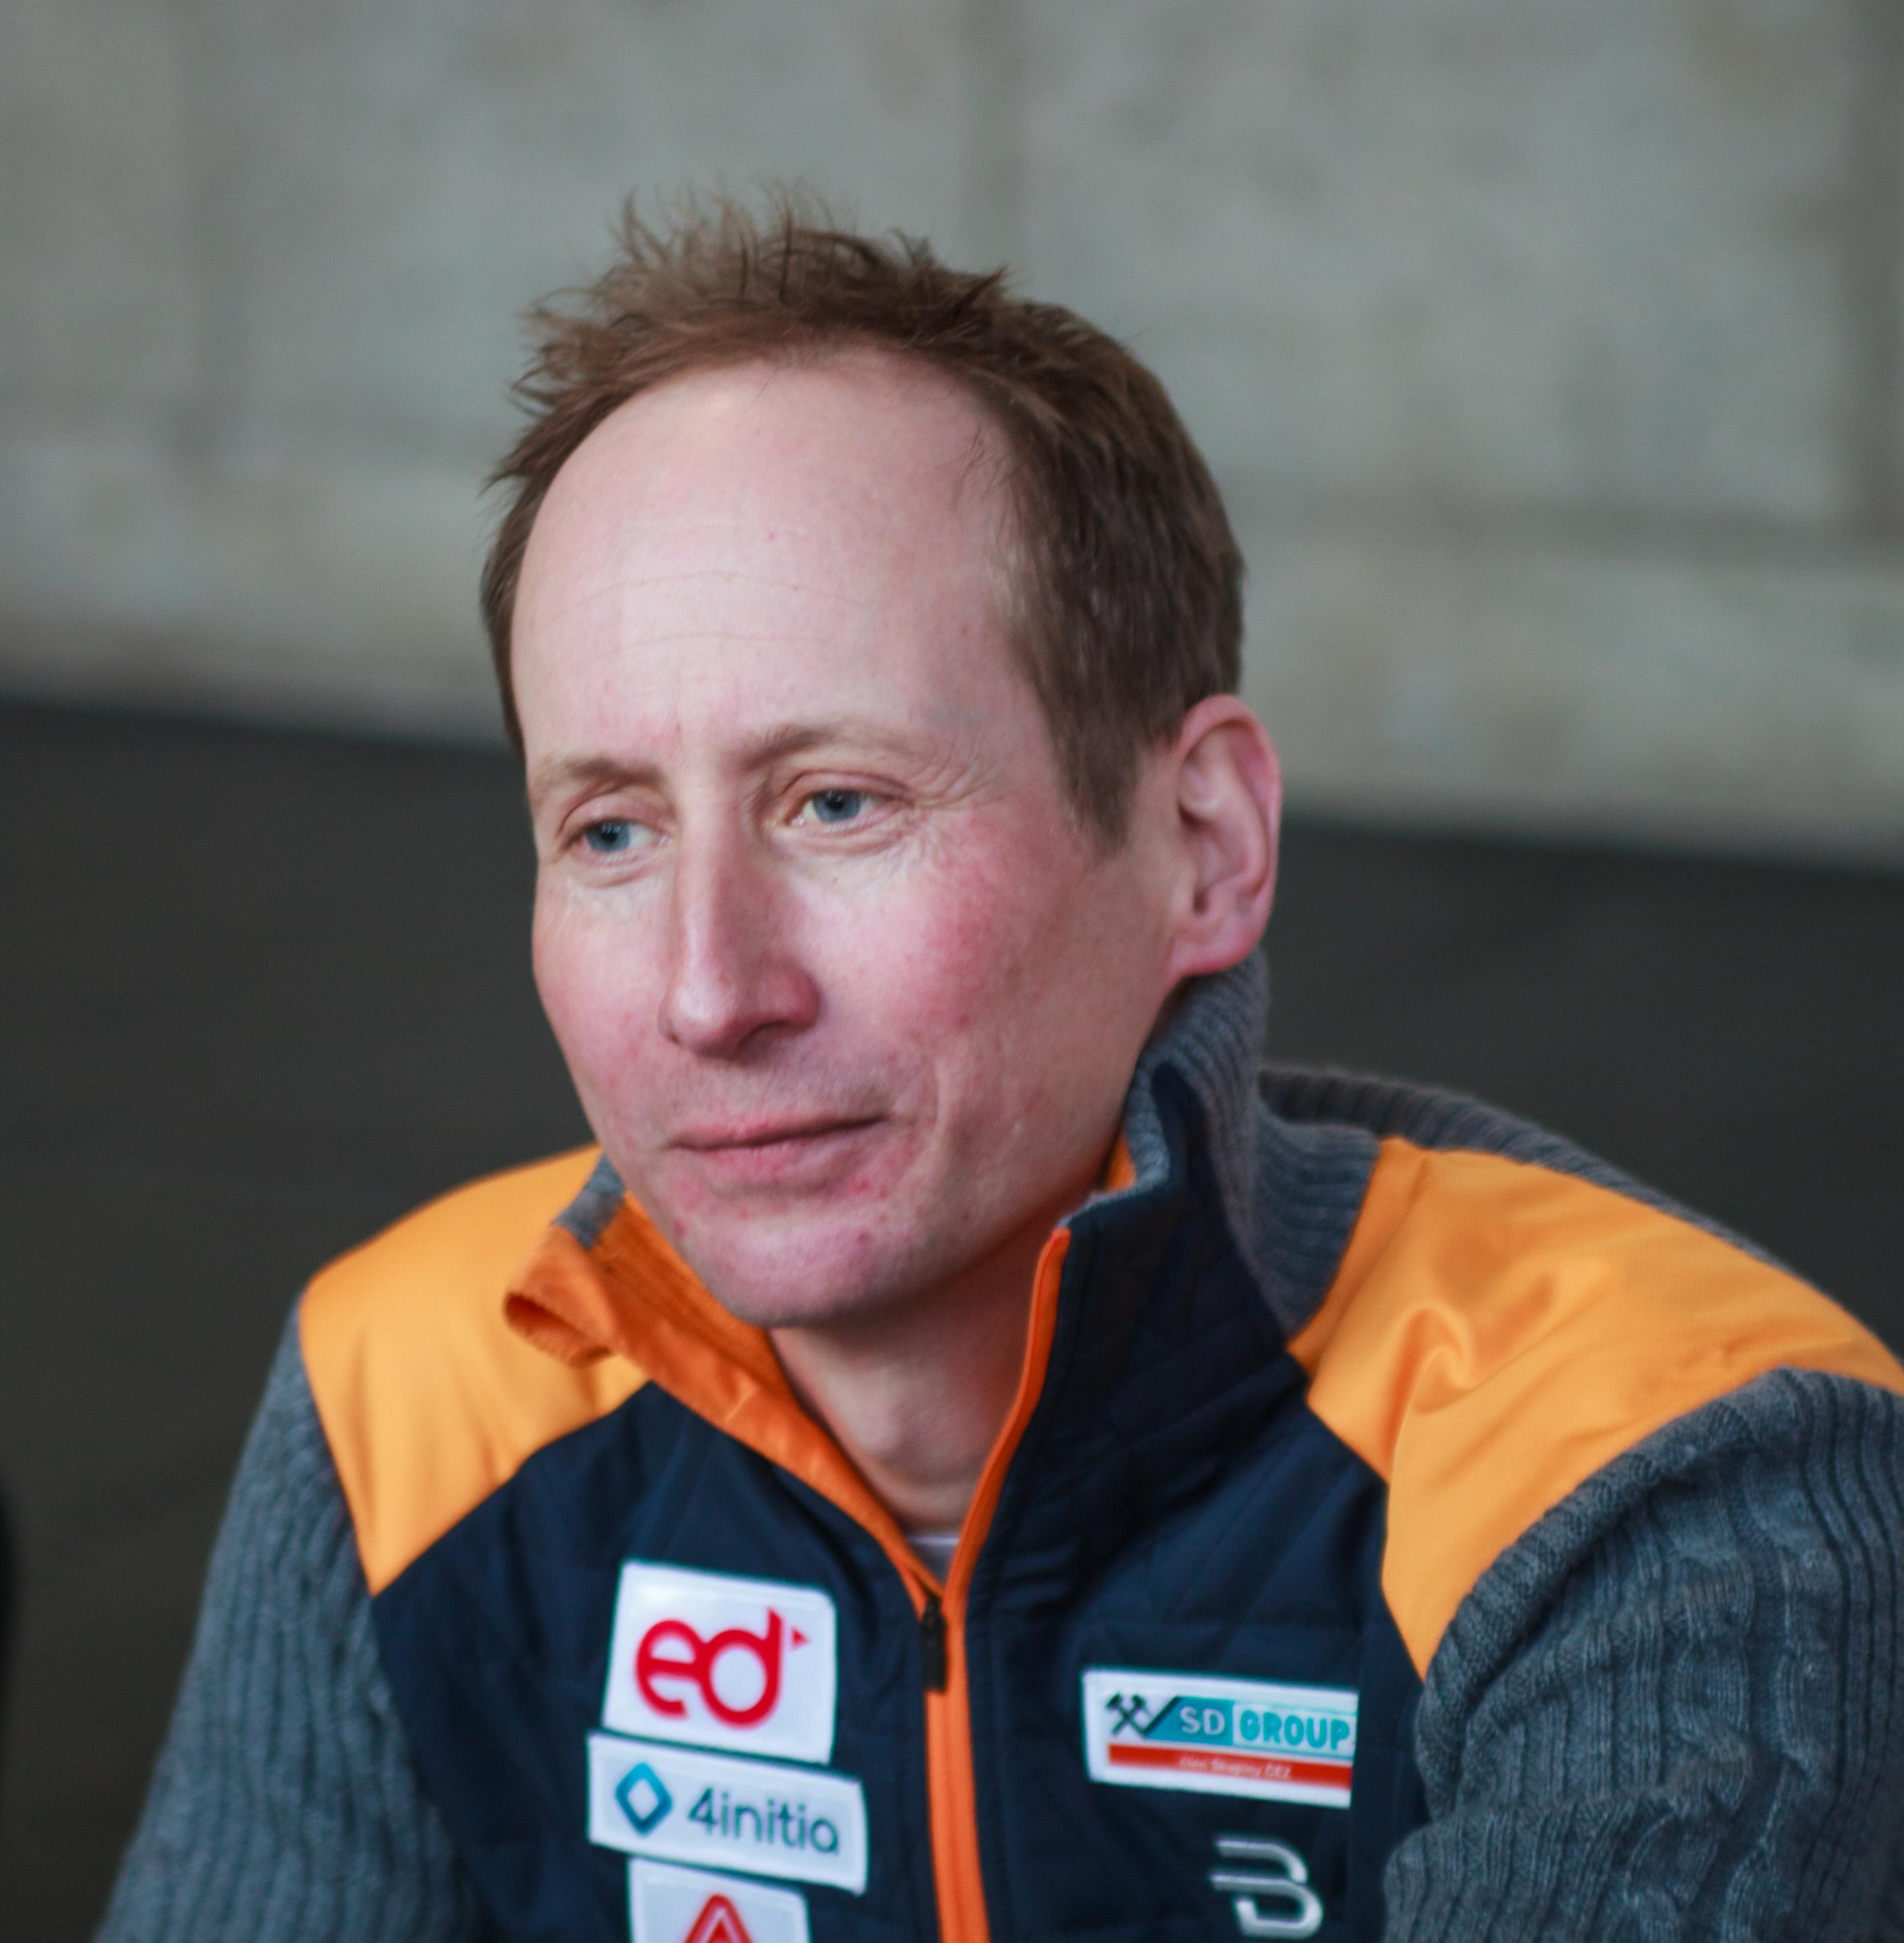 Lukáš Bauer in February 2019